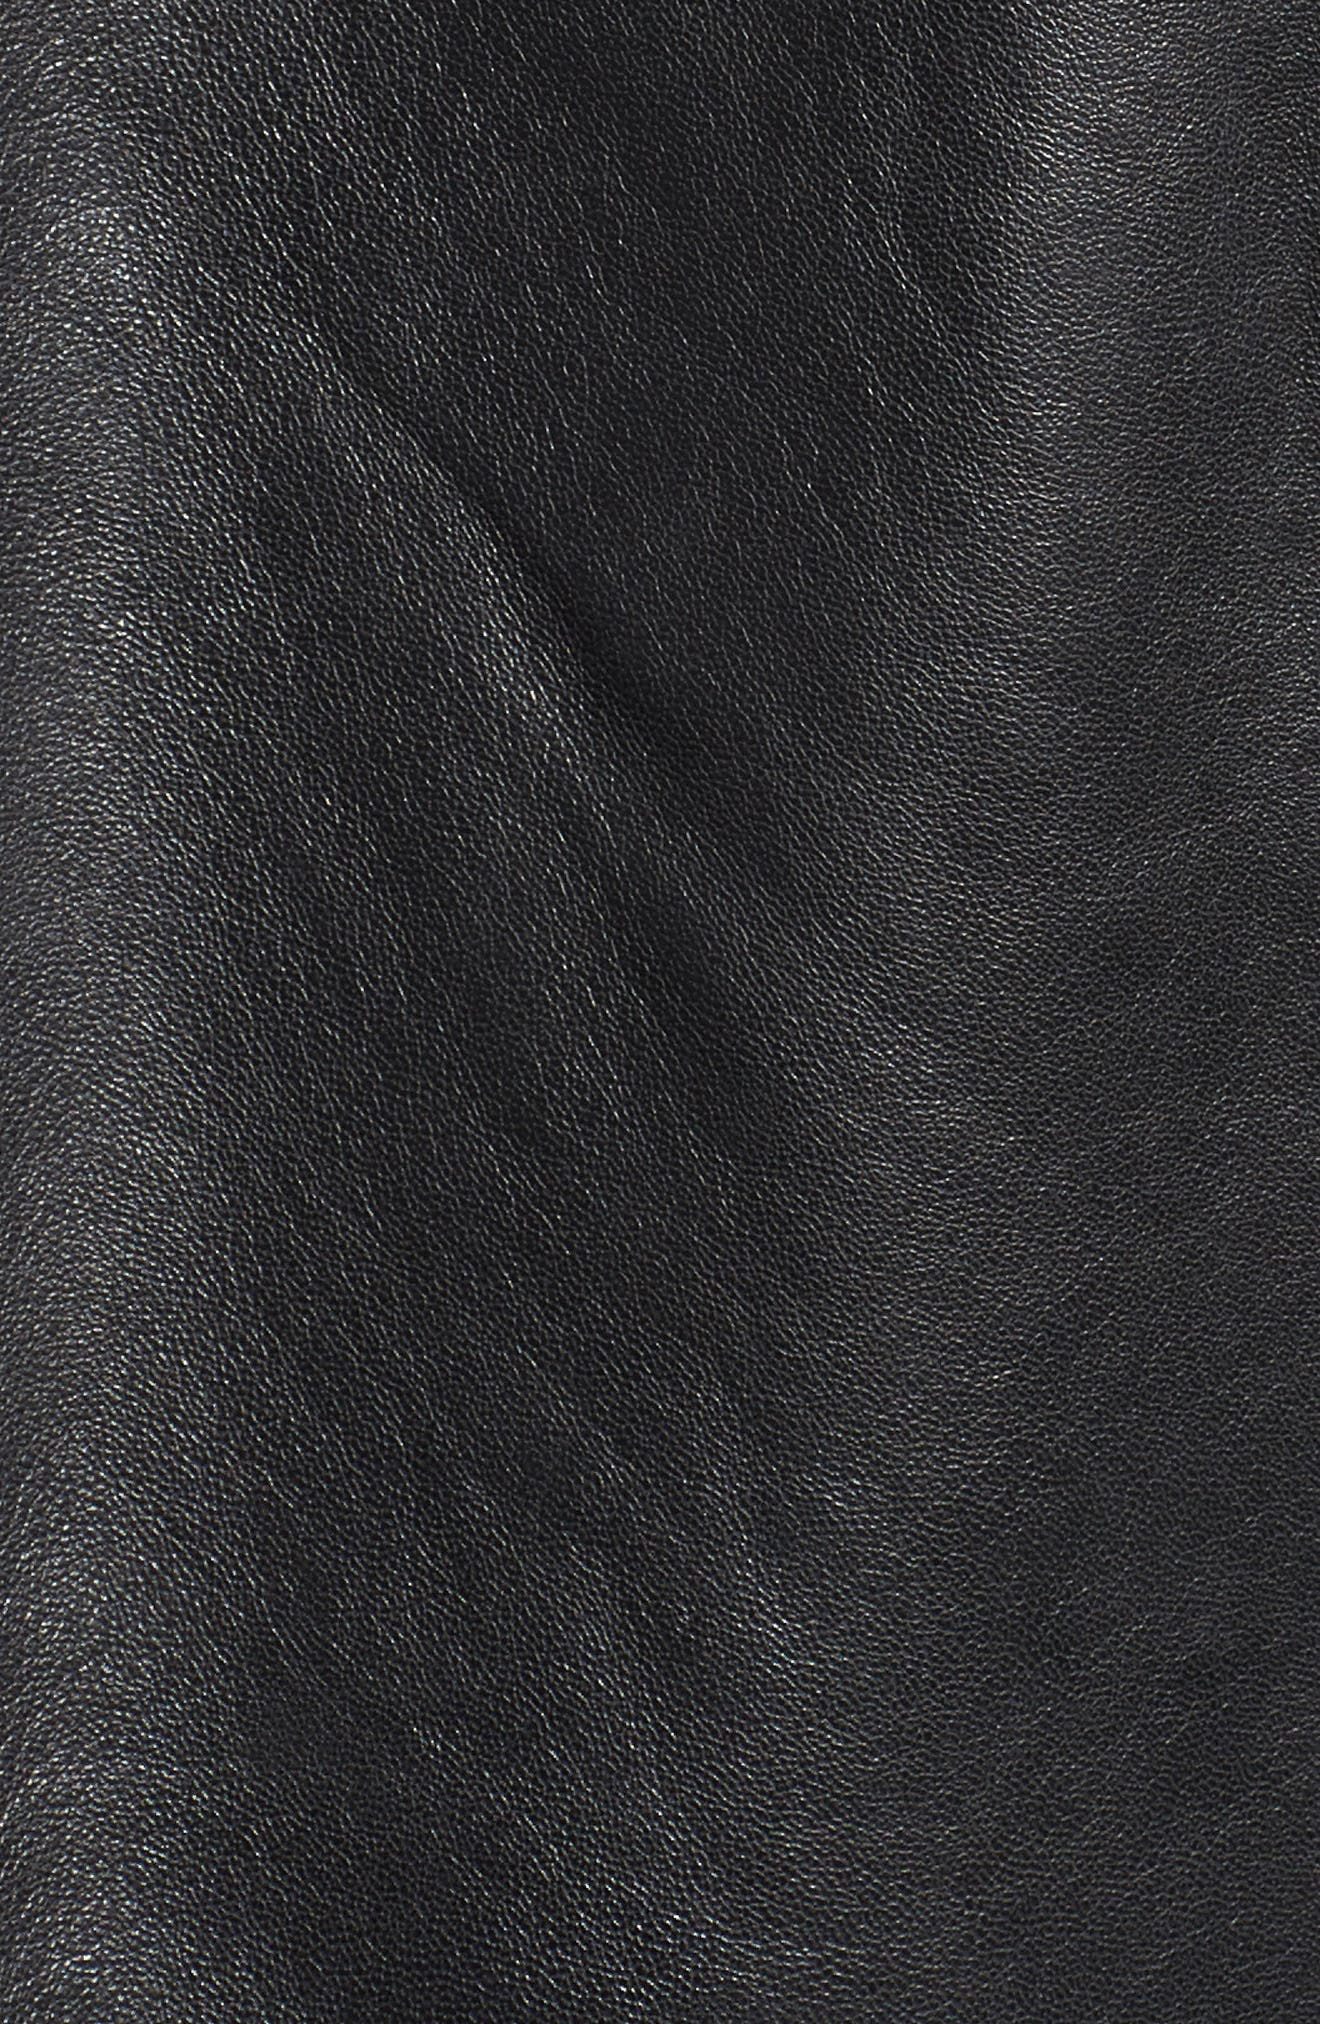 Kirwin Sheepskin Leather Jacket,                             Alternate thumbnail 6, color,                             001